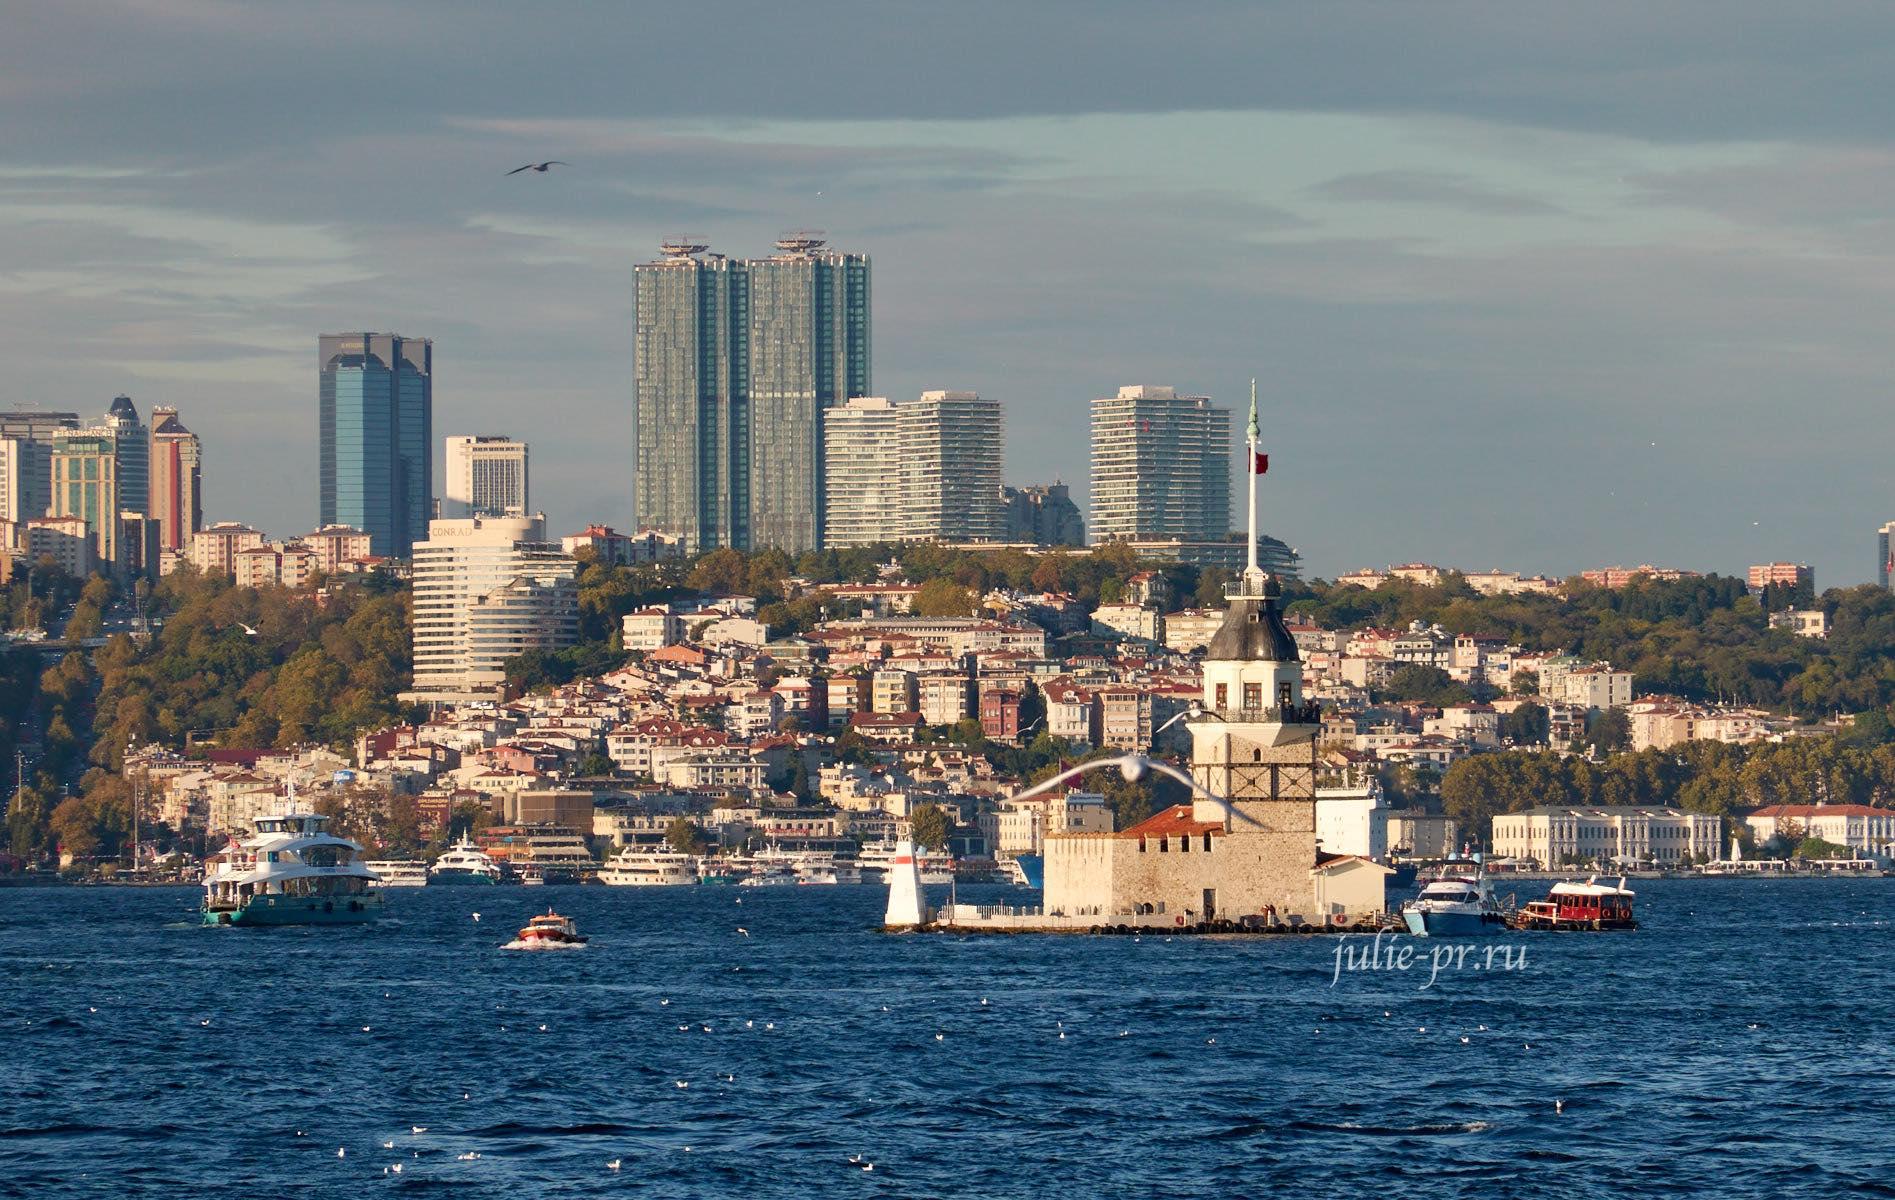 Турция, Стамбул, Девичья башня